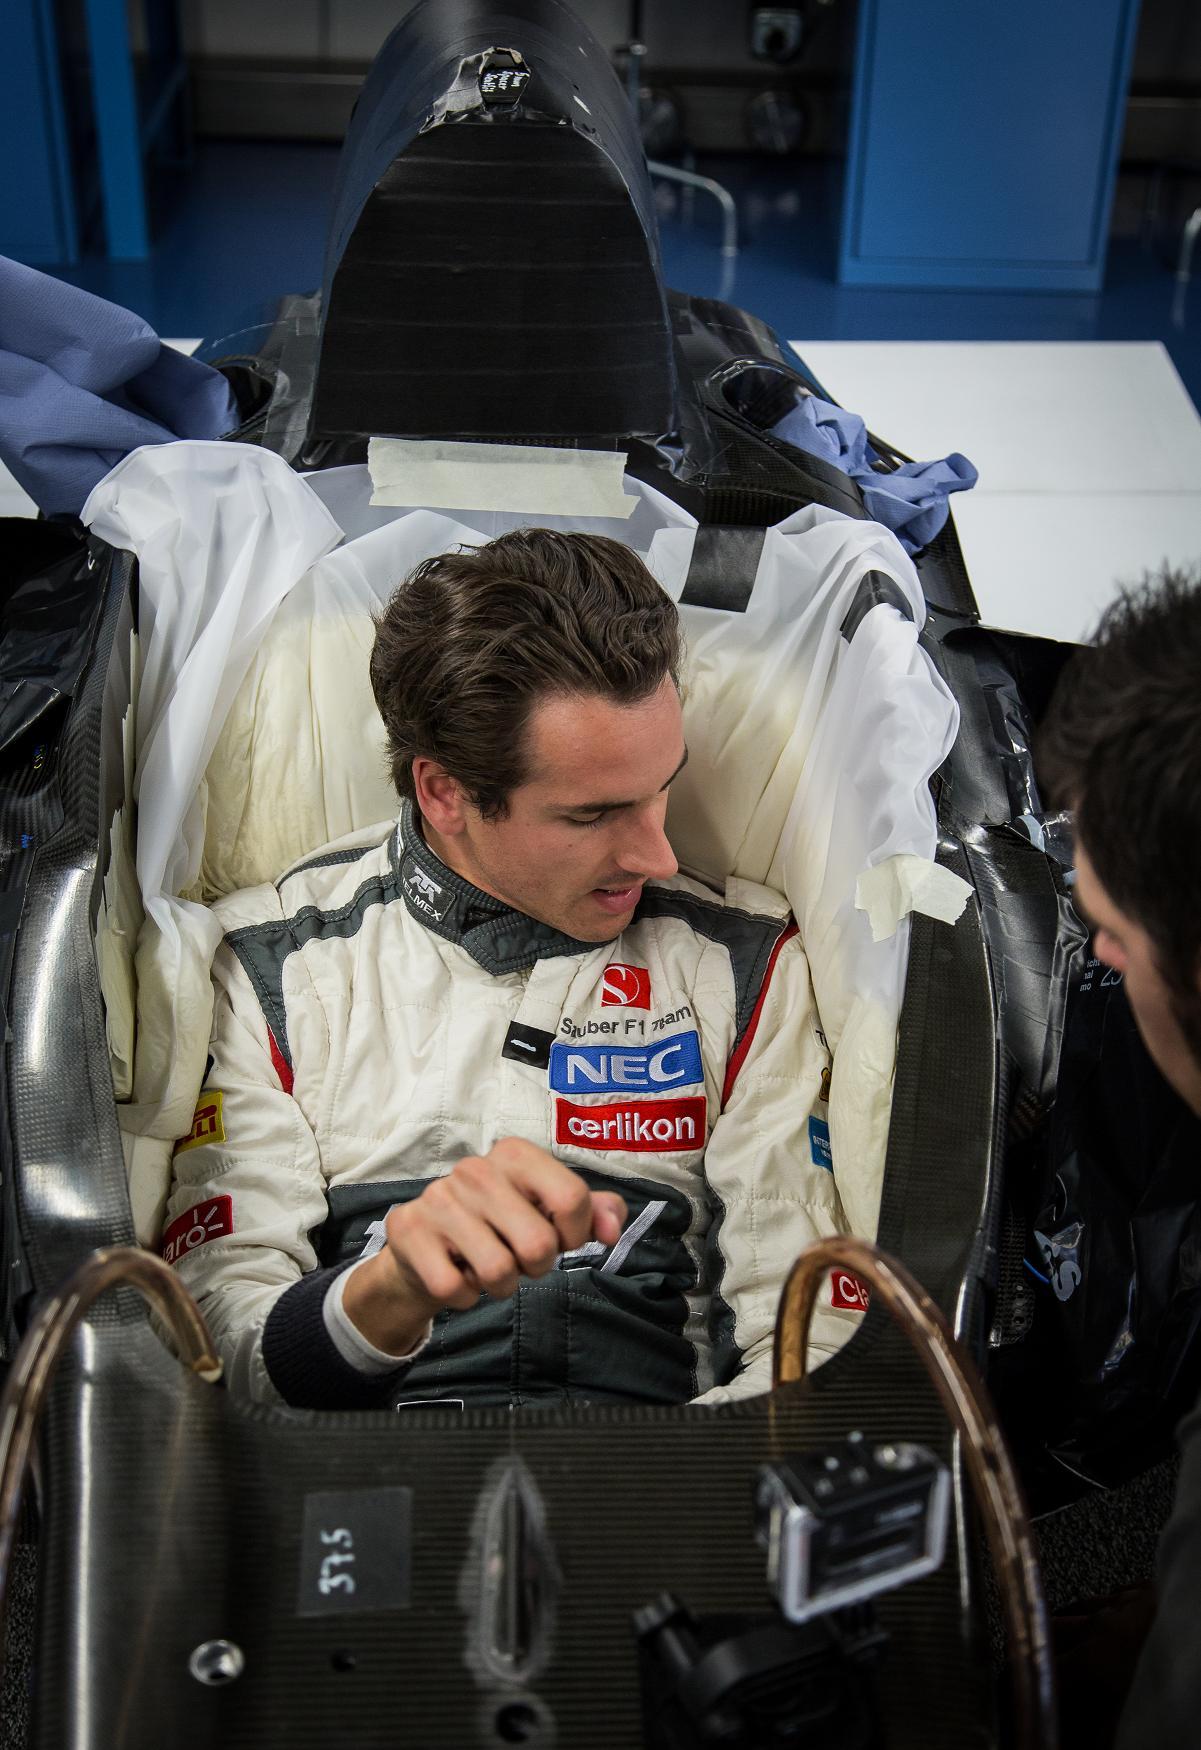 Sutil magára öltötte a Sauber F1 Team szerelését: Galéria